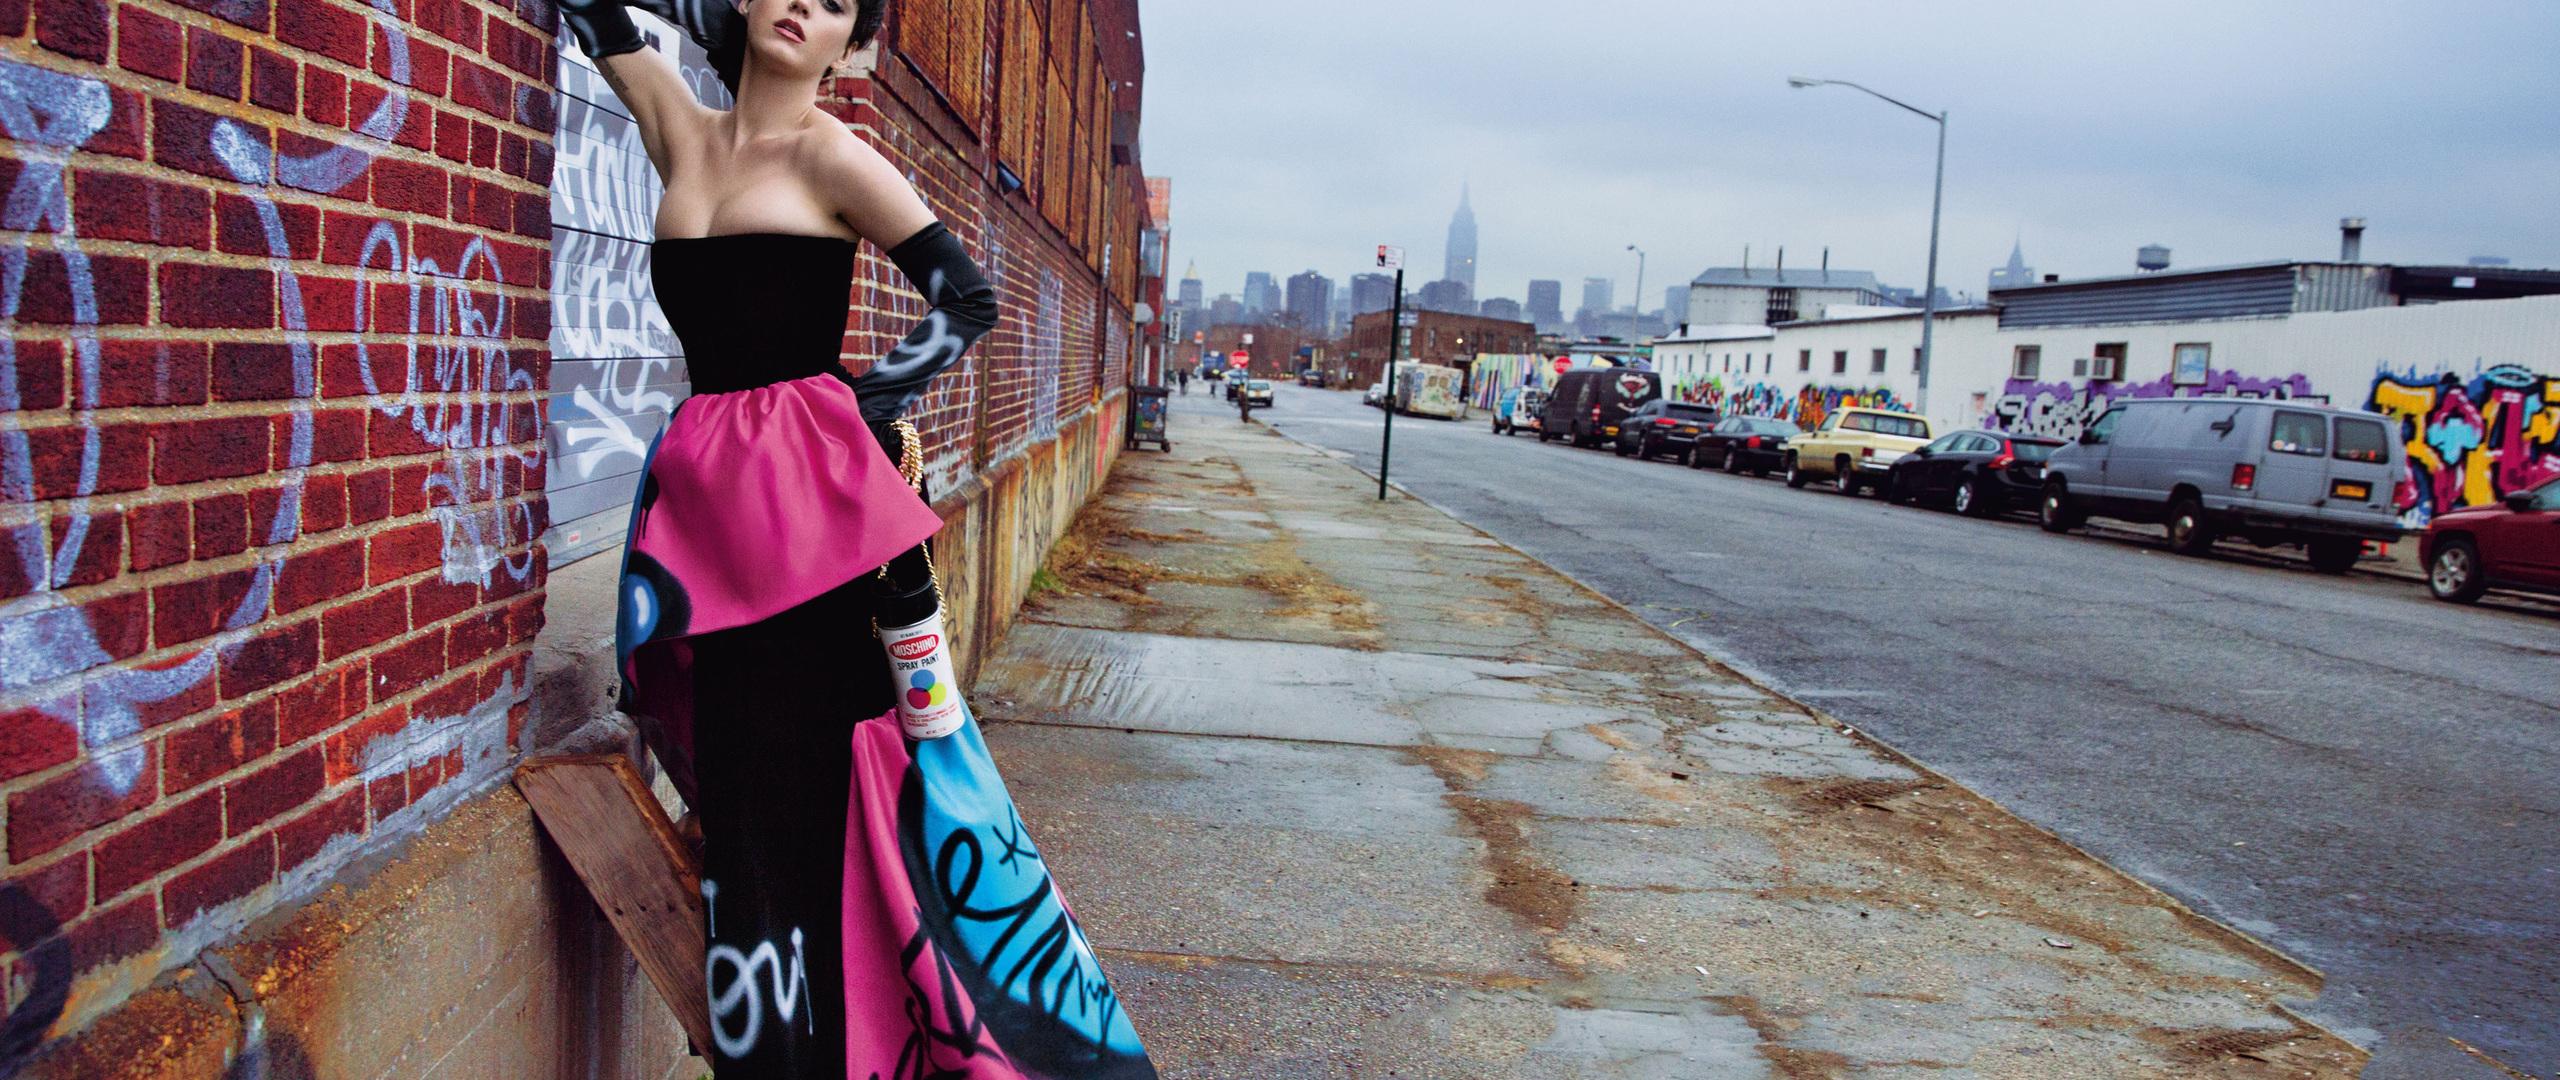 katy-perry-moschino-campaign-2018-gb.jpg